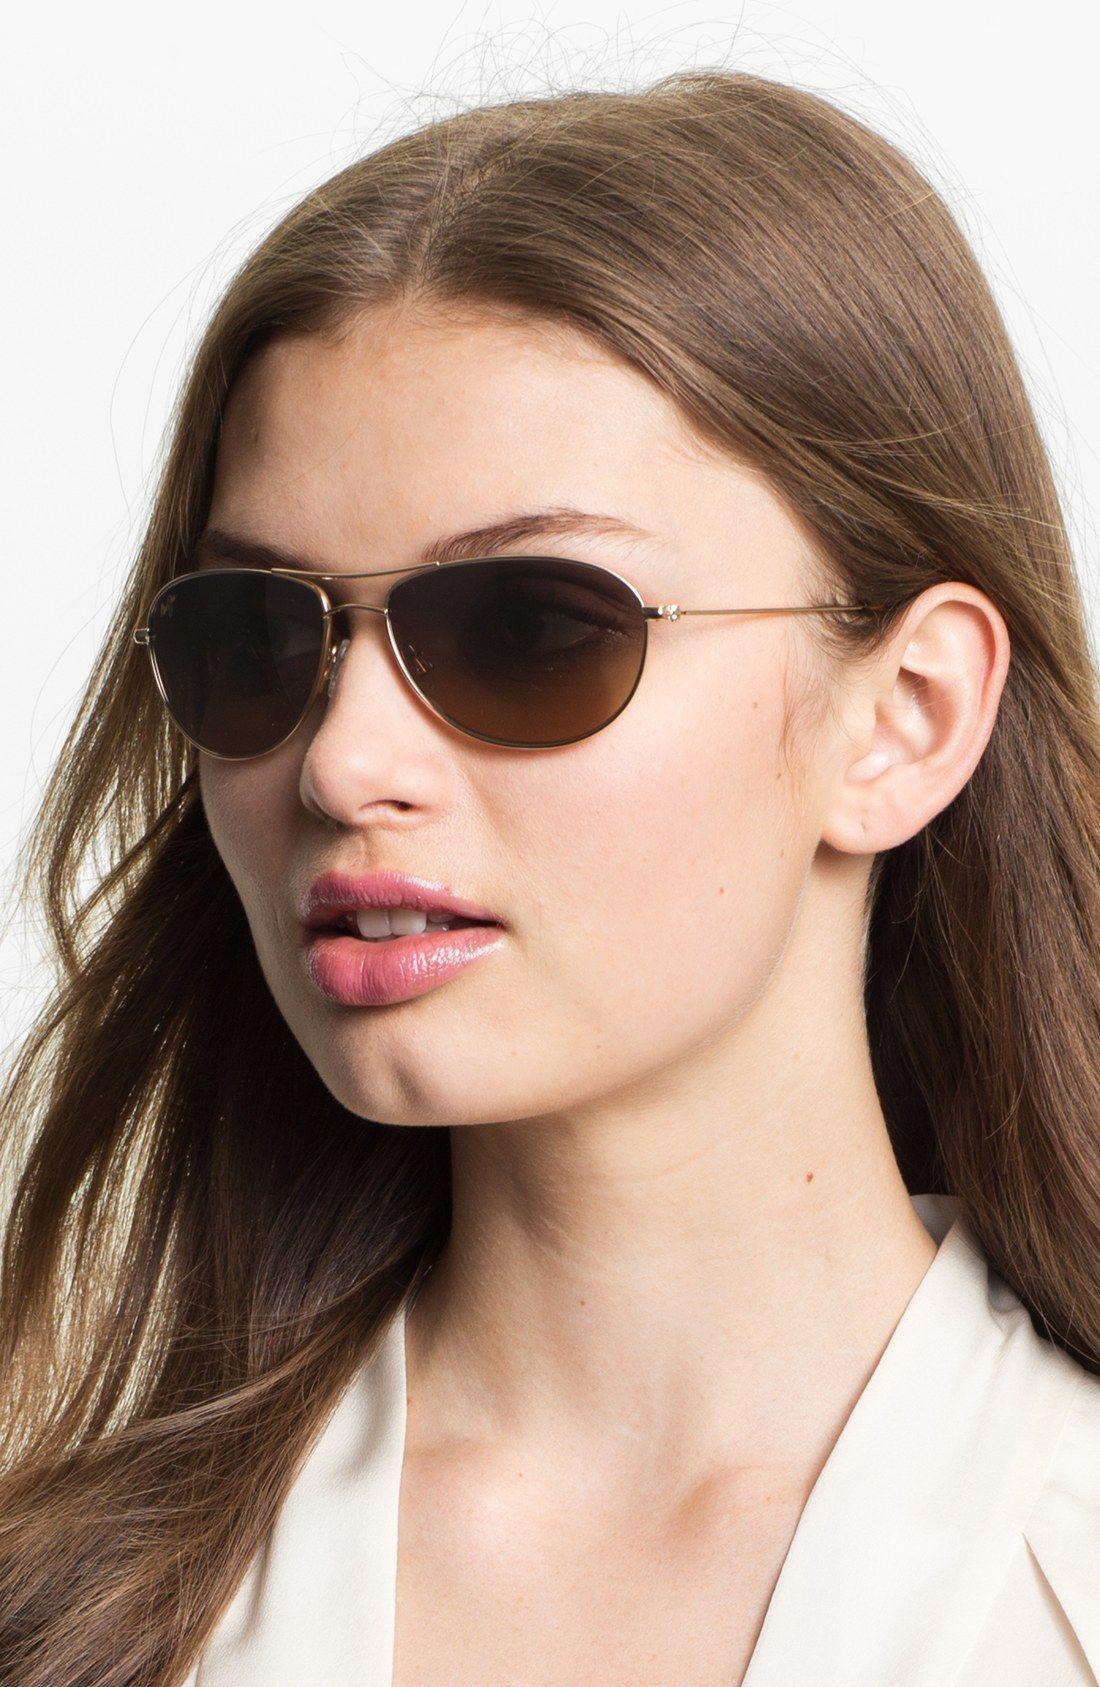 0a56c8af8ae51 Maui Jim  Baby Beach - PolarizedPlus®2  56mm Sunglasses